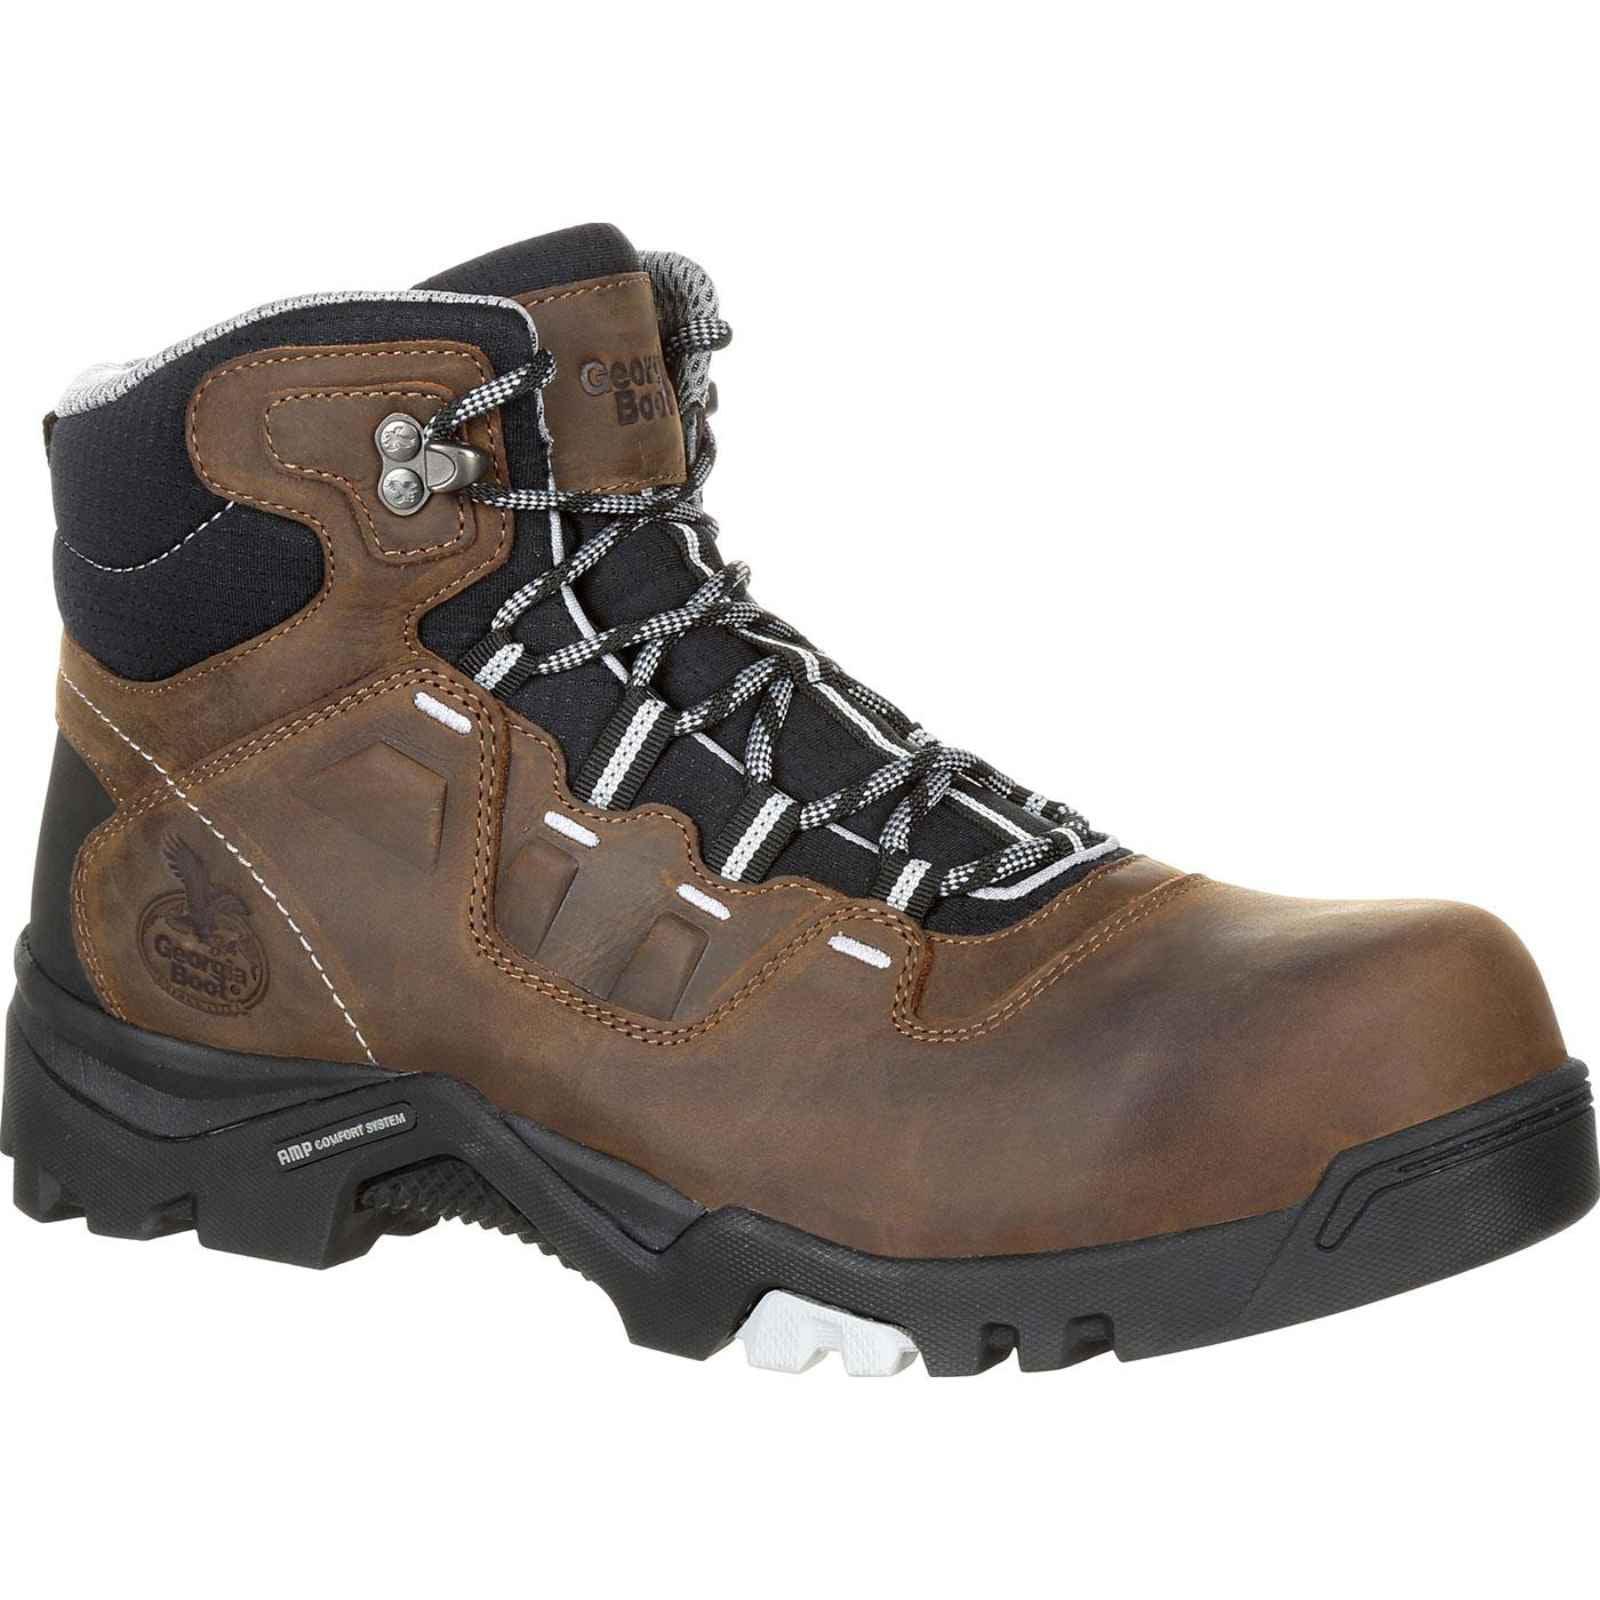 Georgia Boot Men's Brown Amplitude Composite Toe Waterproof Work Boot GB00216 by Georgia